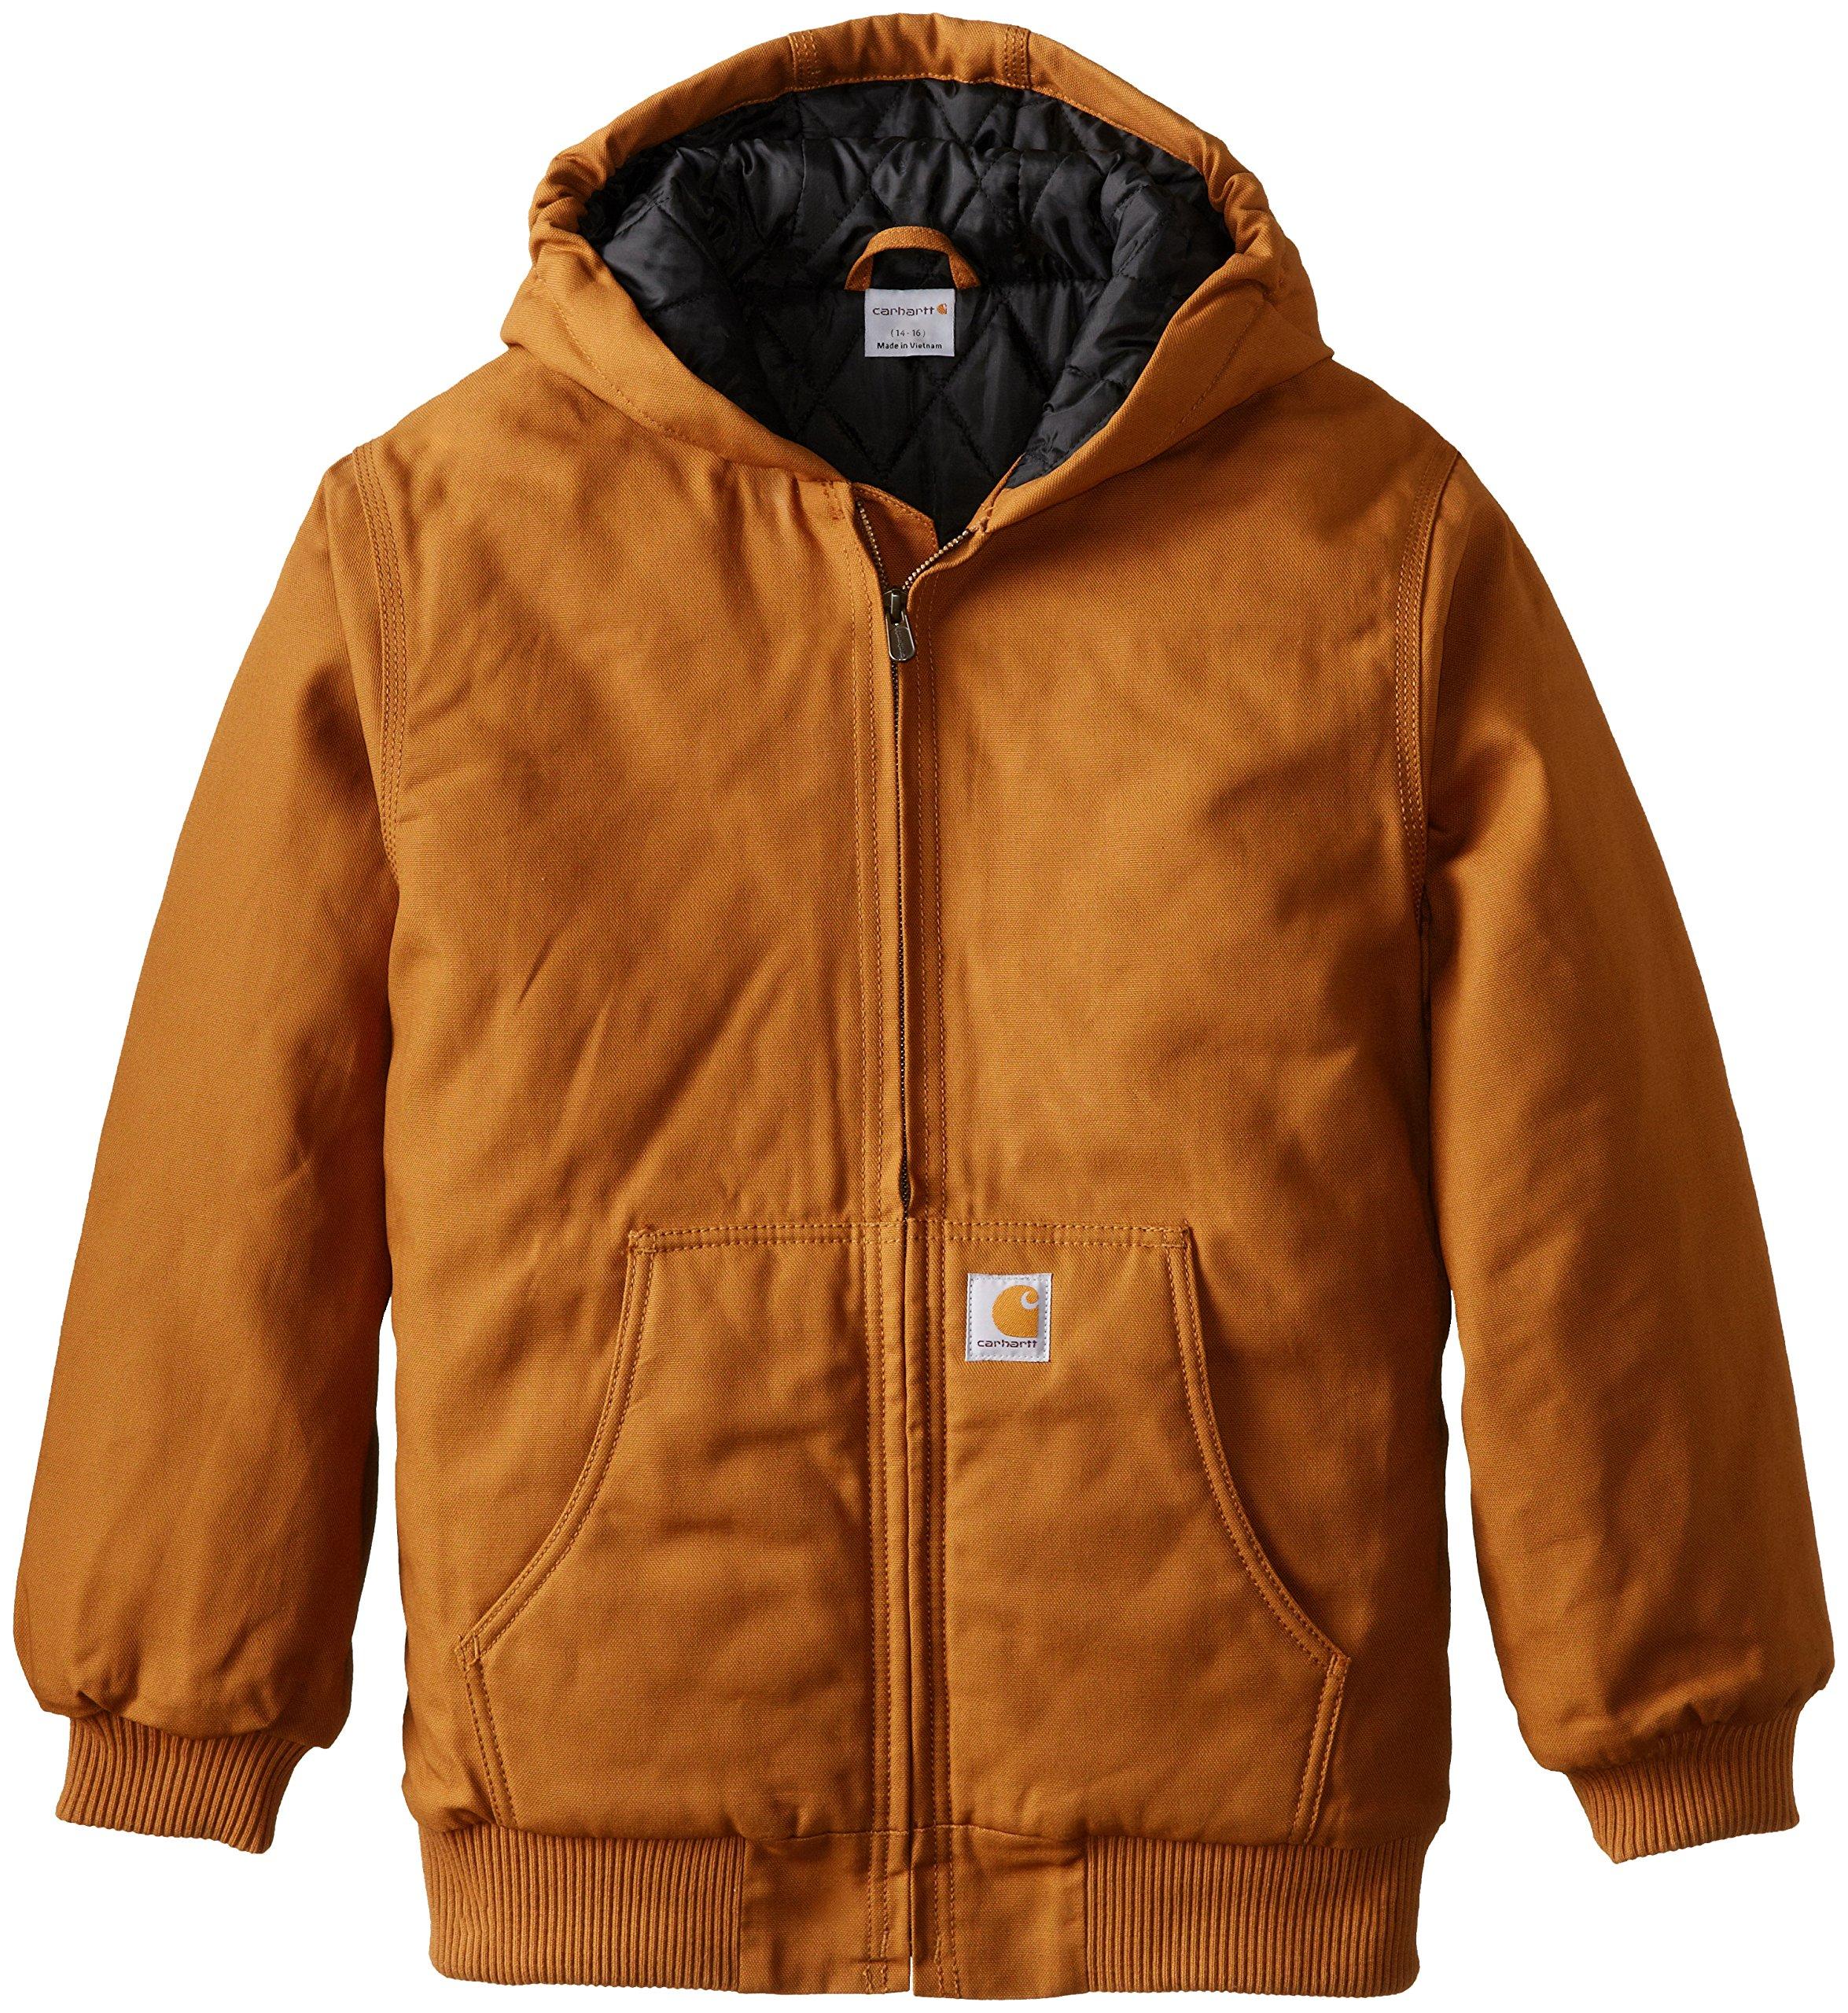 Carhartt Big Boys' Work Active Jacket, Carhartt Brown, Small/7/8